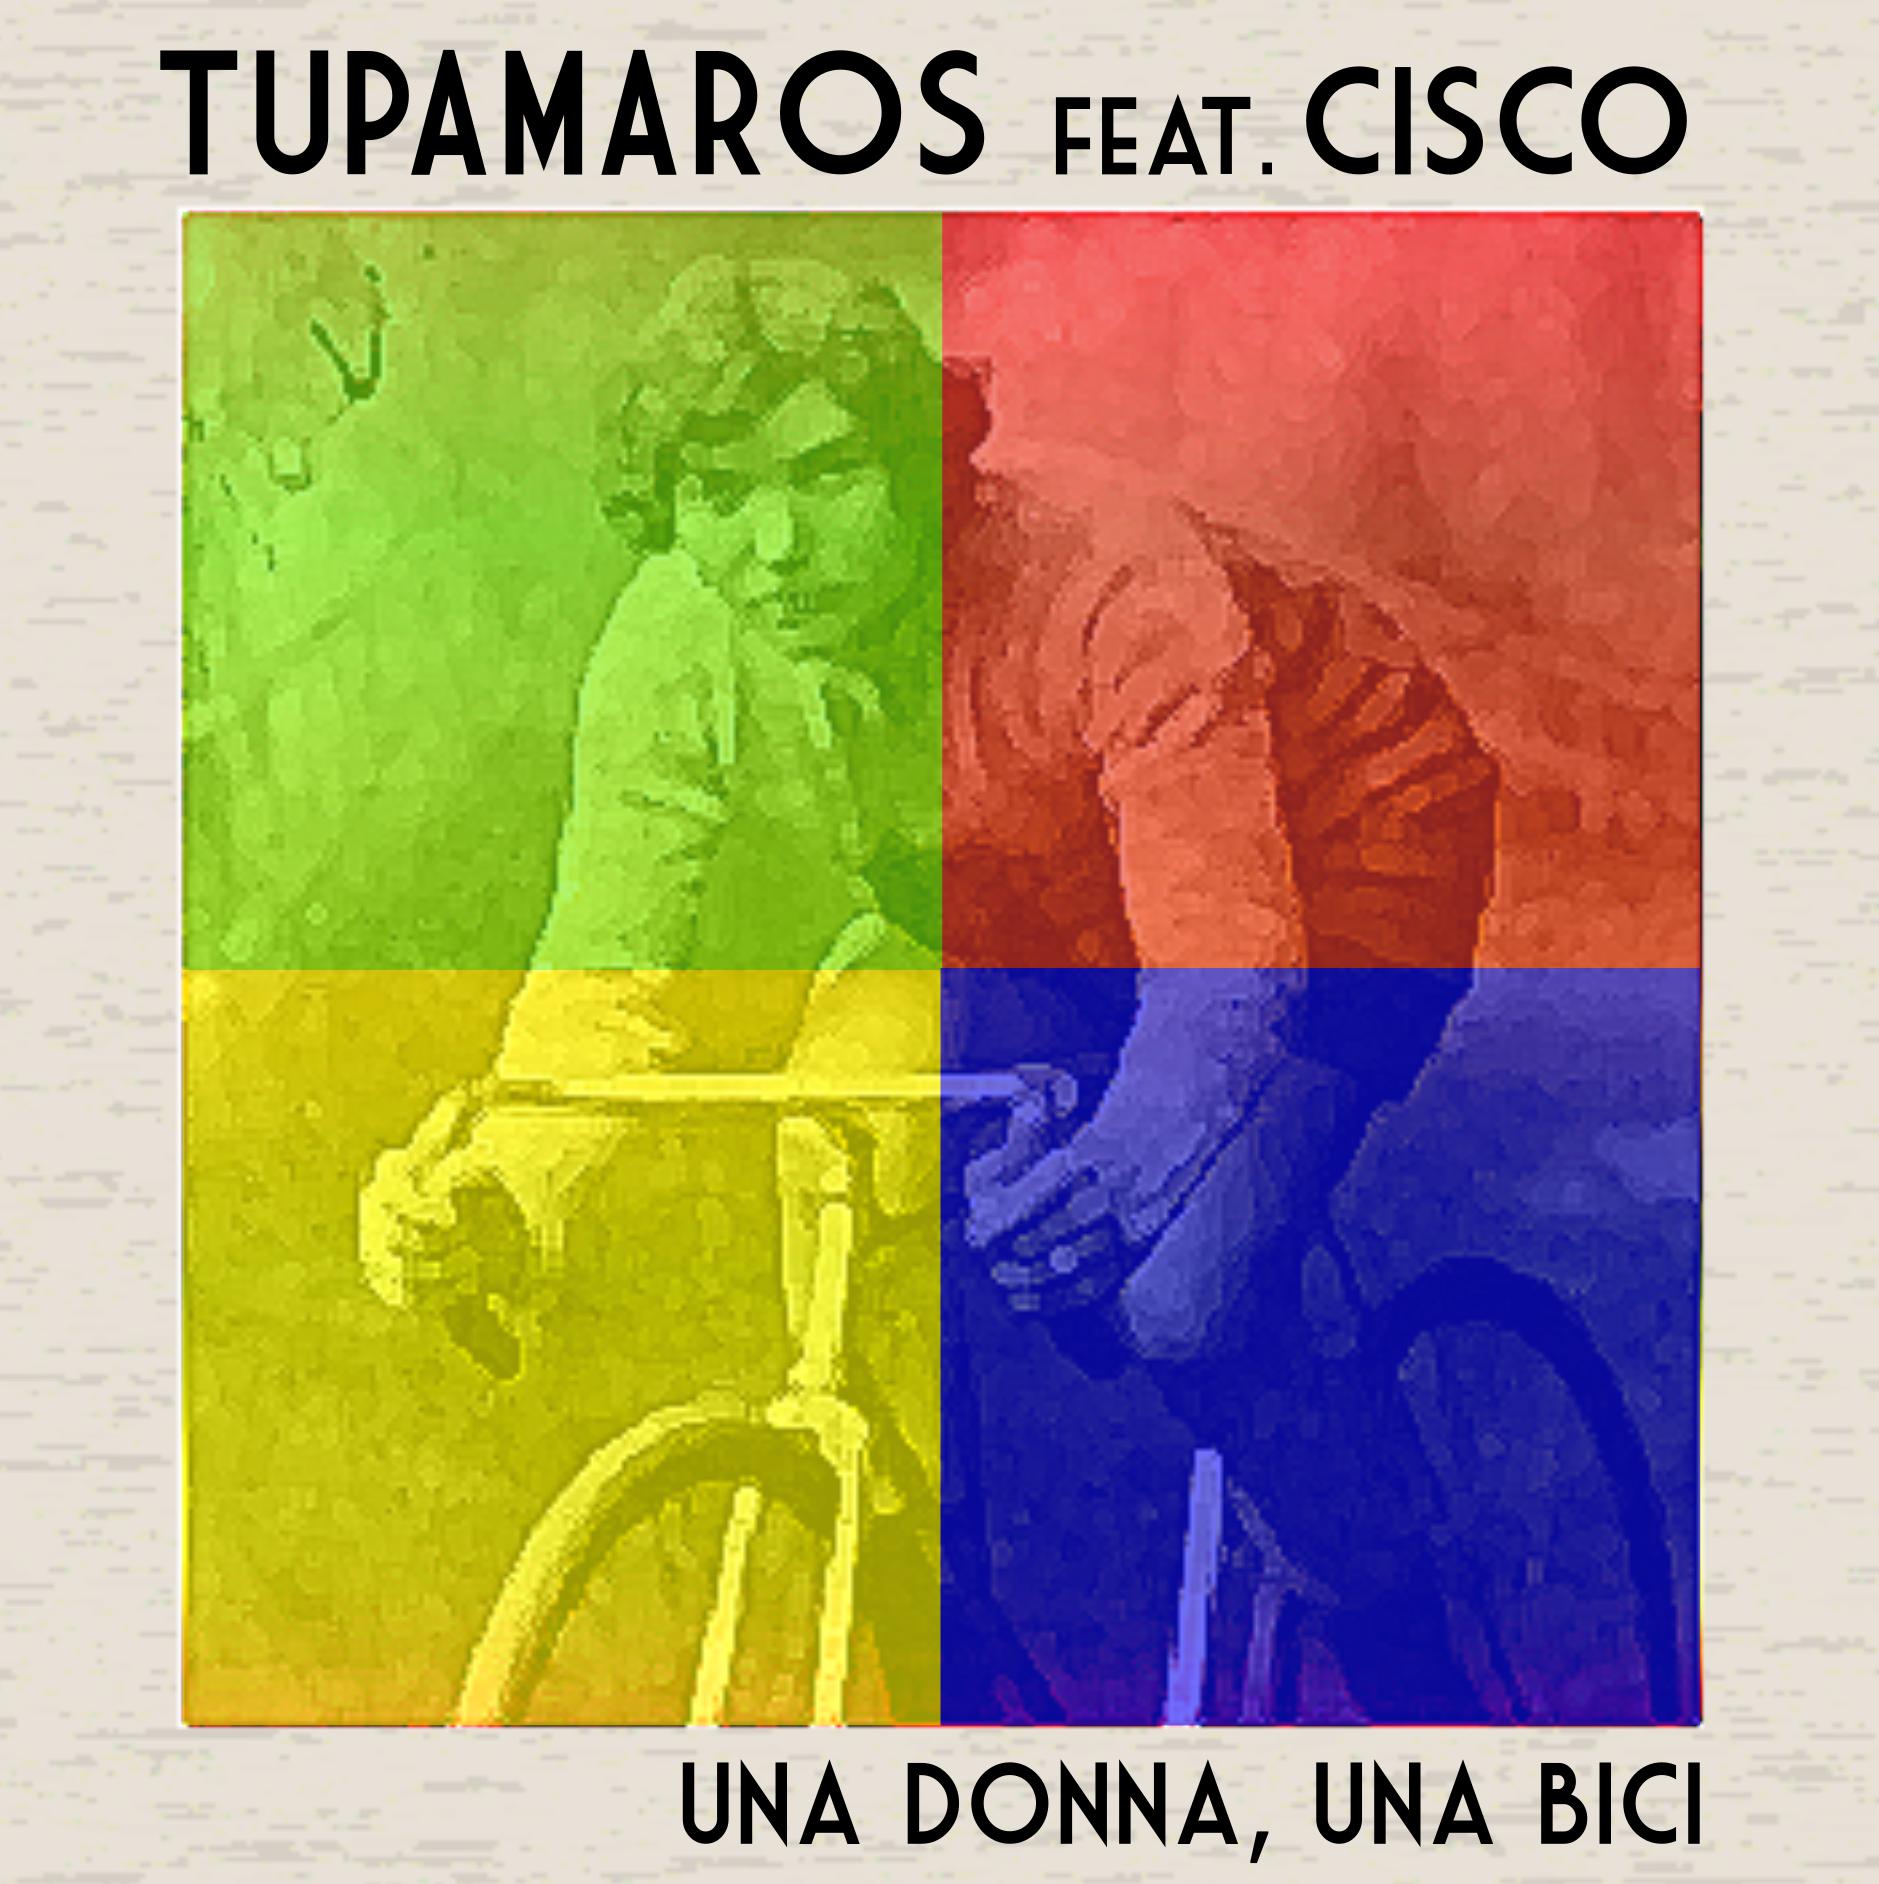 Una donna, una bici.  Tupamaros. Copertina singolo